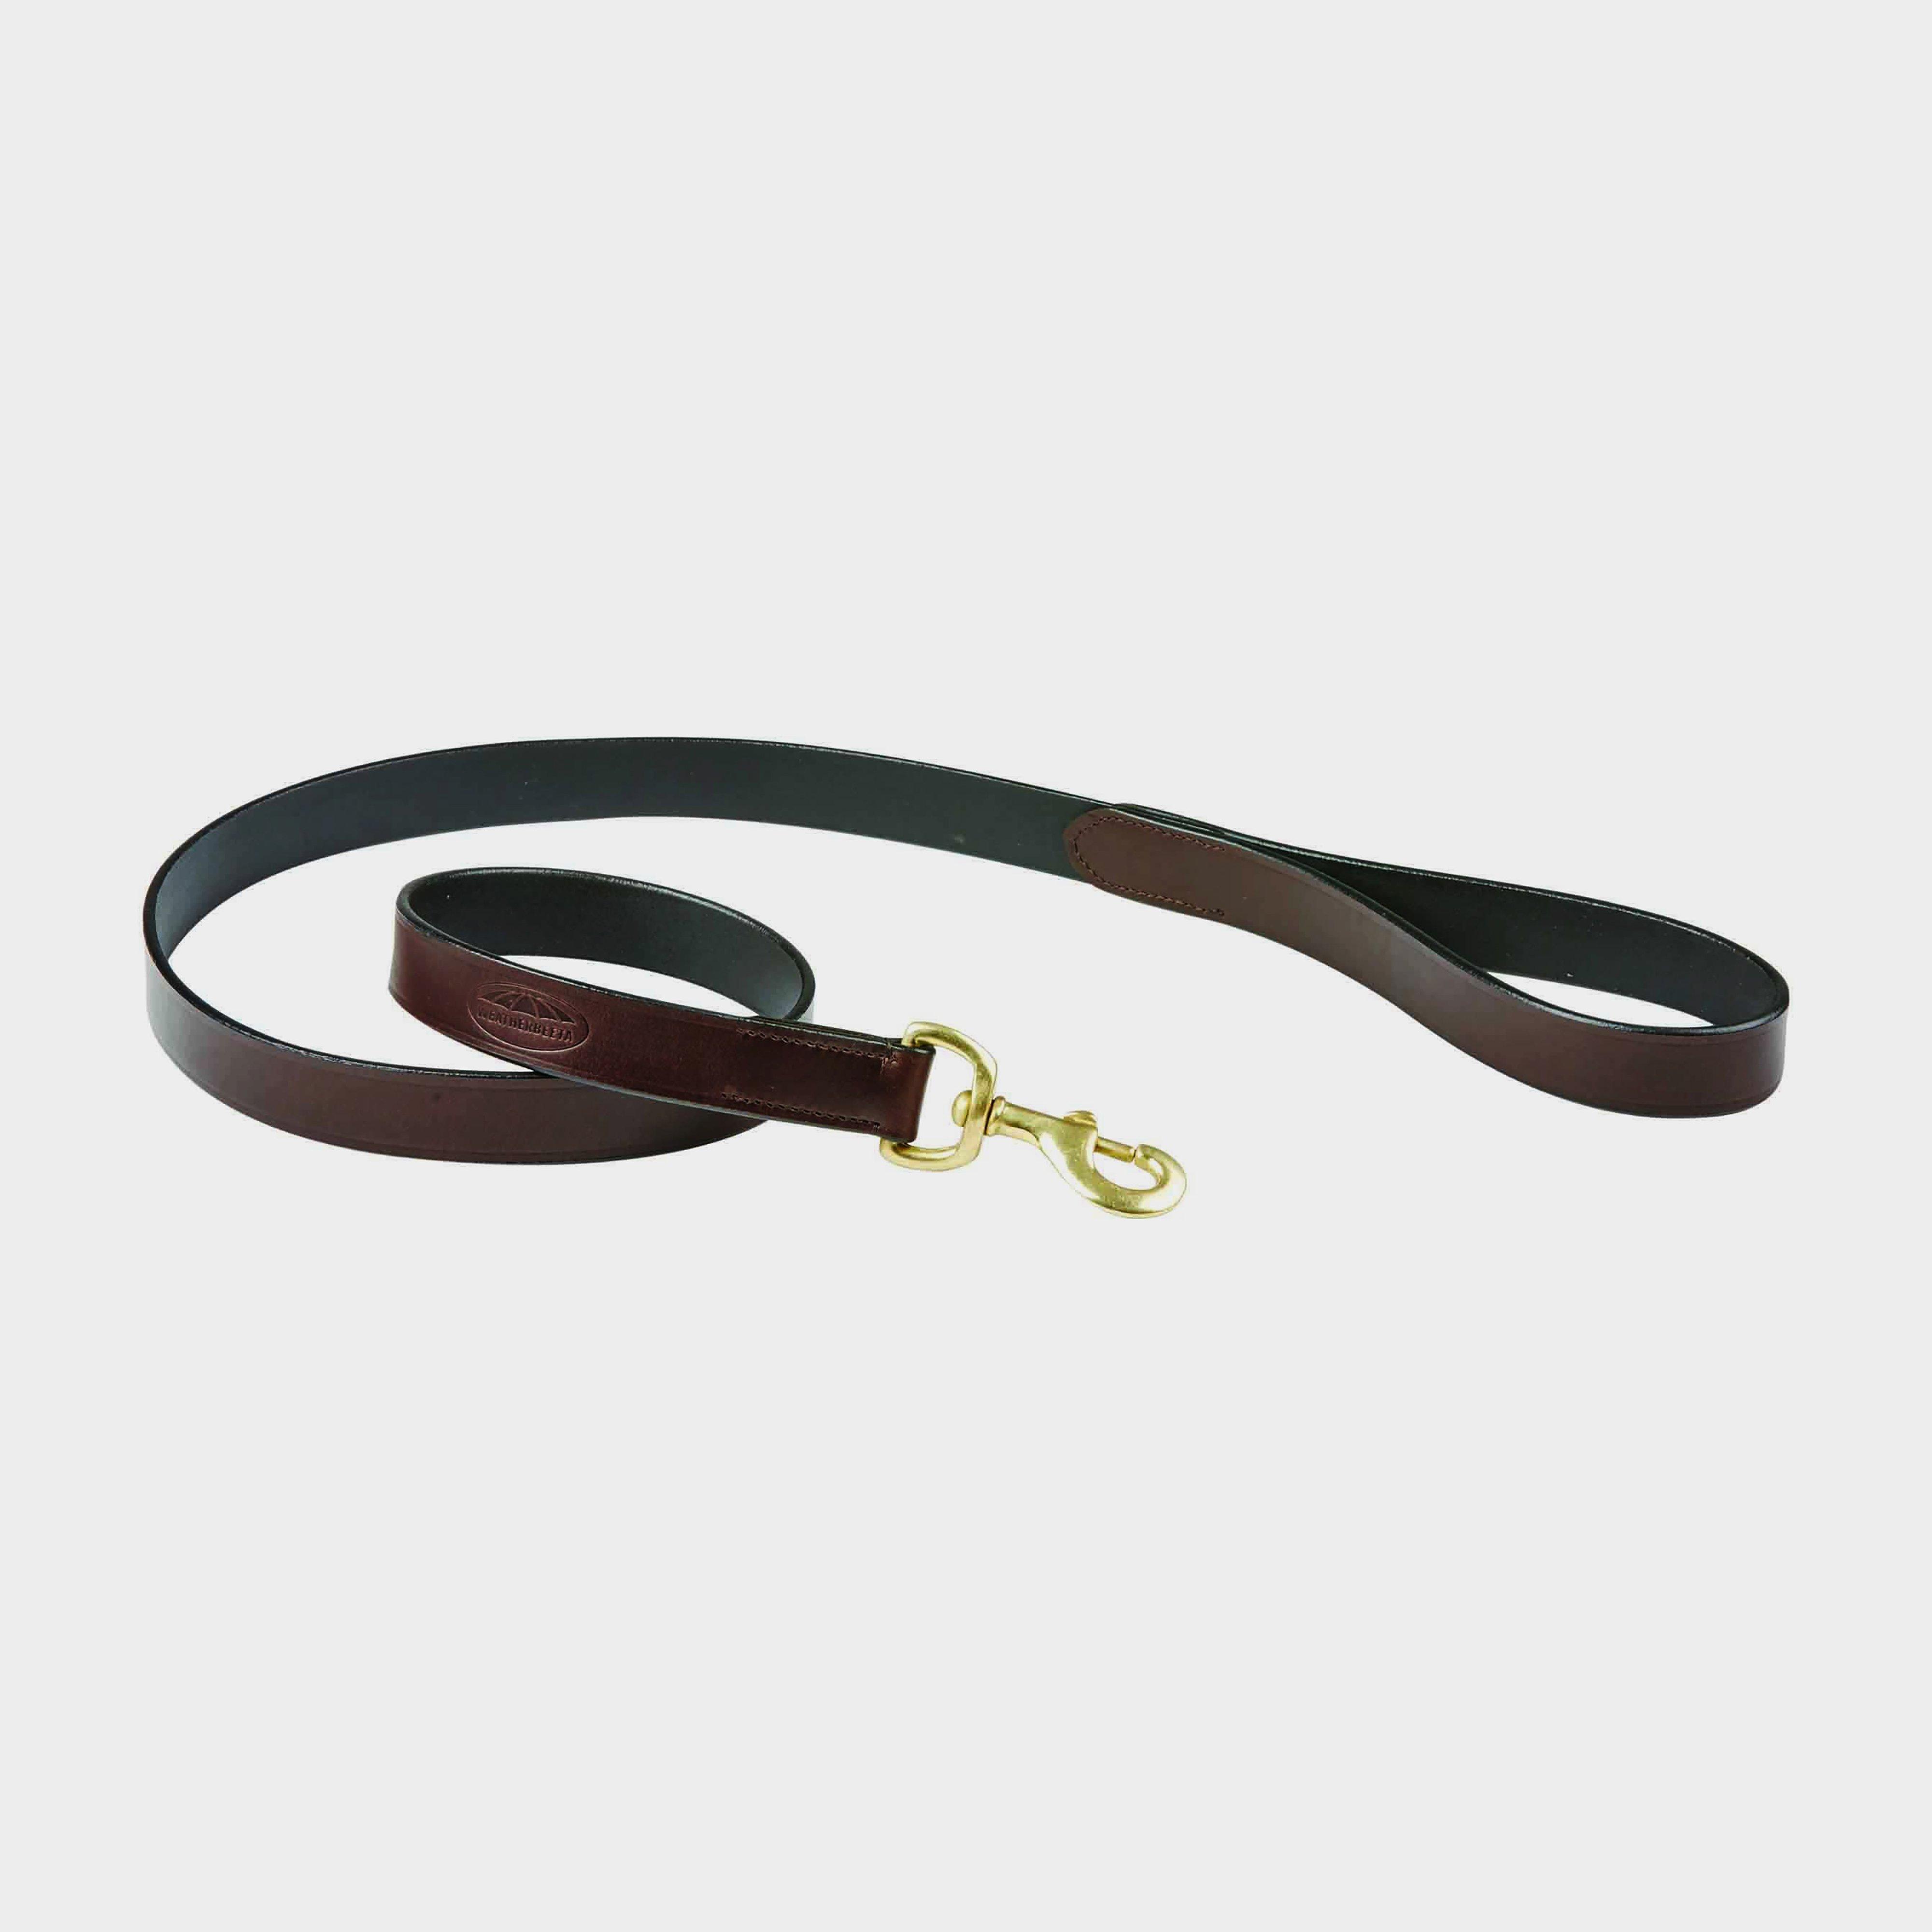 Image of Weatherbeeta Leather Dog Lead - Brown/Brown, Brown/Brown